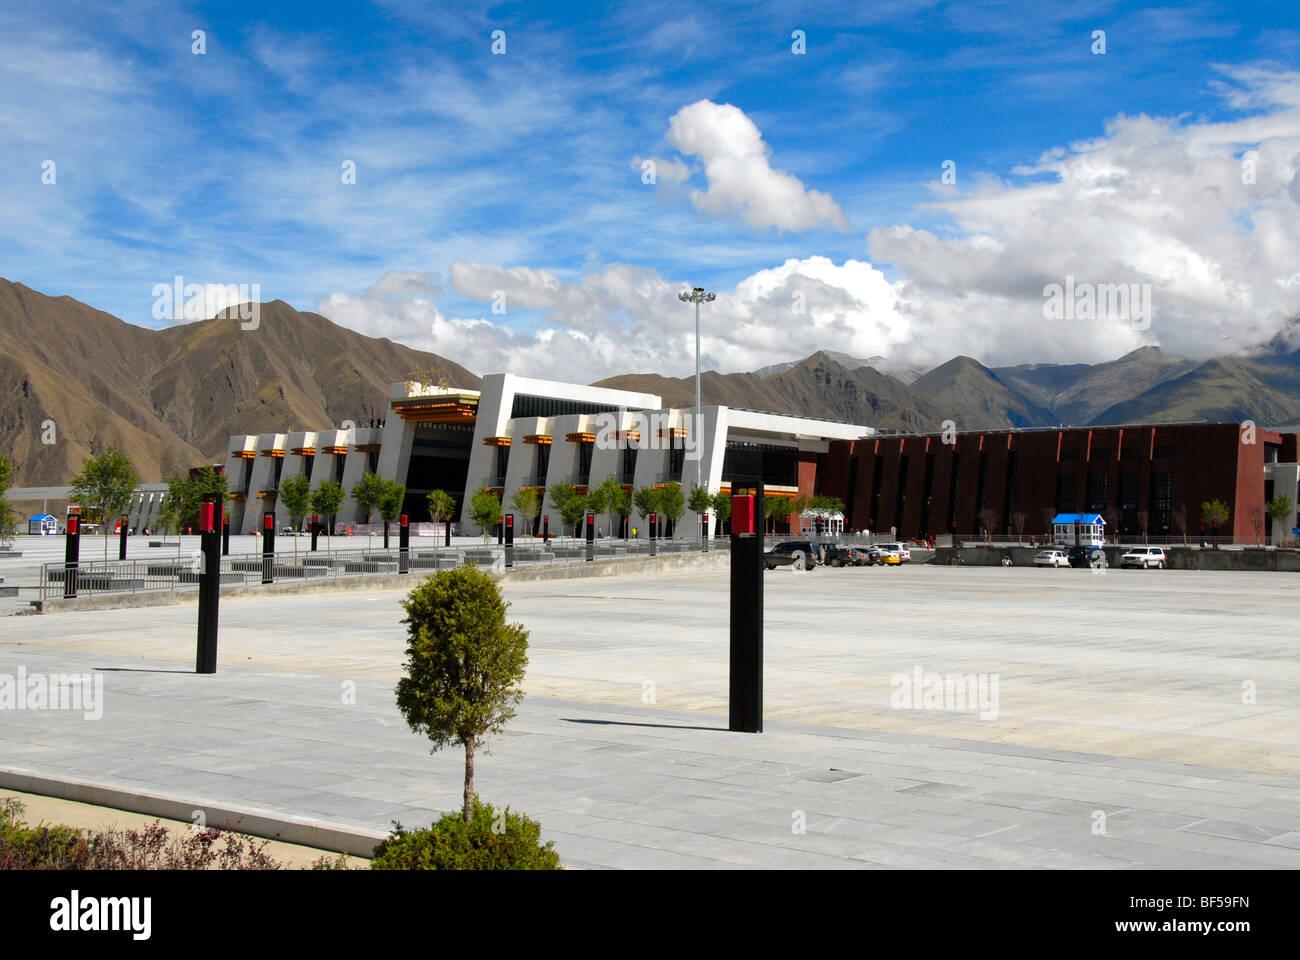 Modern Tibetan architecture, railway station in Lhasa, Himalayas, Tibet Autonomous Region, People's Republic of Stock Photo